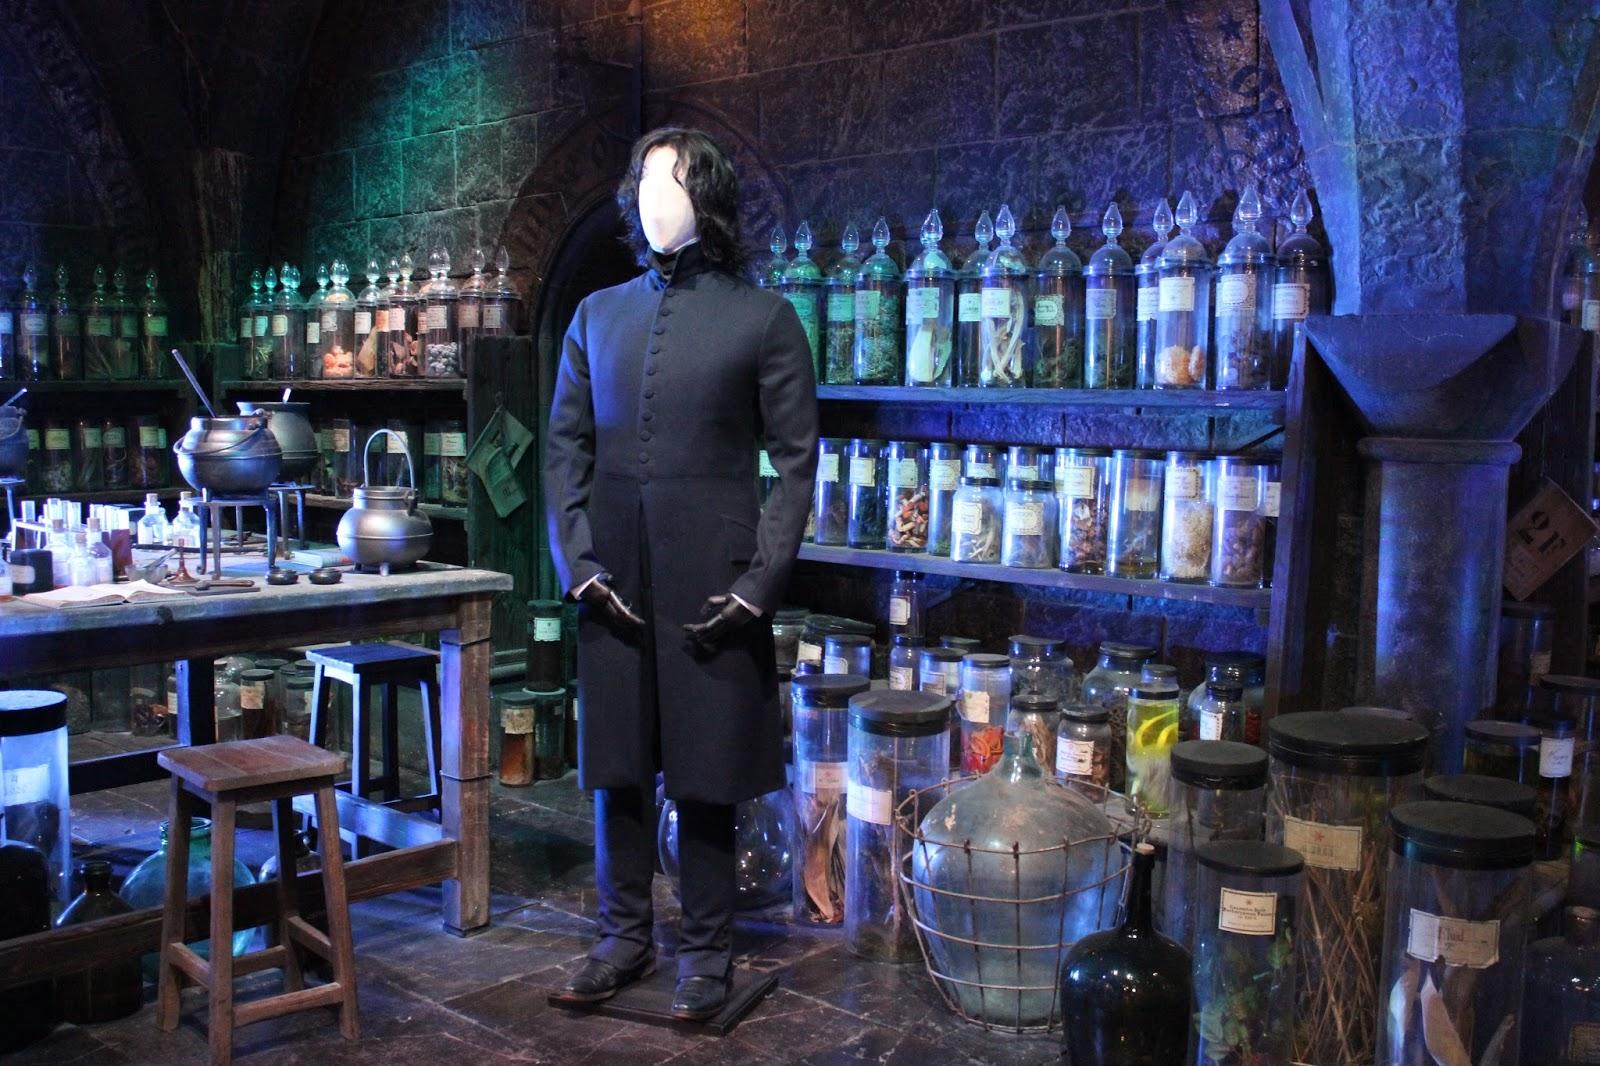 Harry Potter studio tour london potions classroom and snape